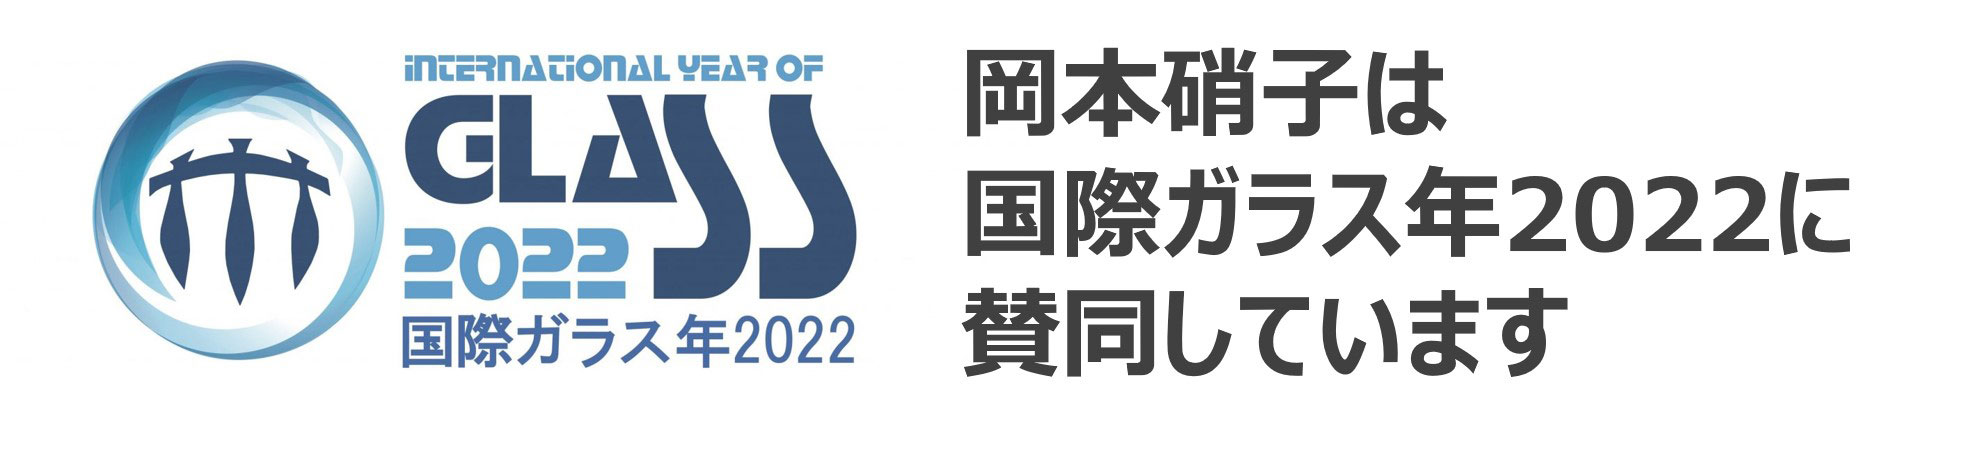 International year of glass 2022 岡本硝子は国際ガラス年2022に賛同しています